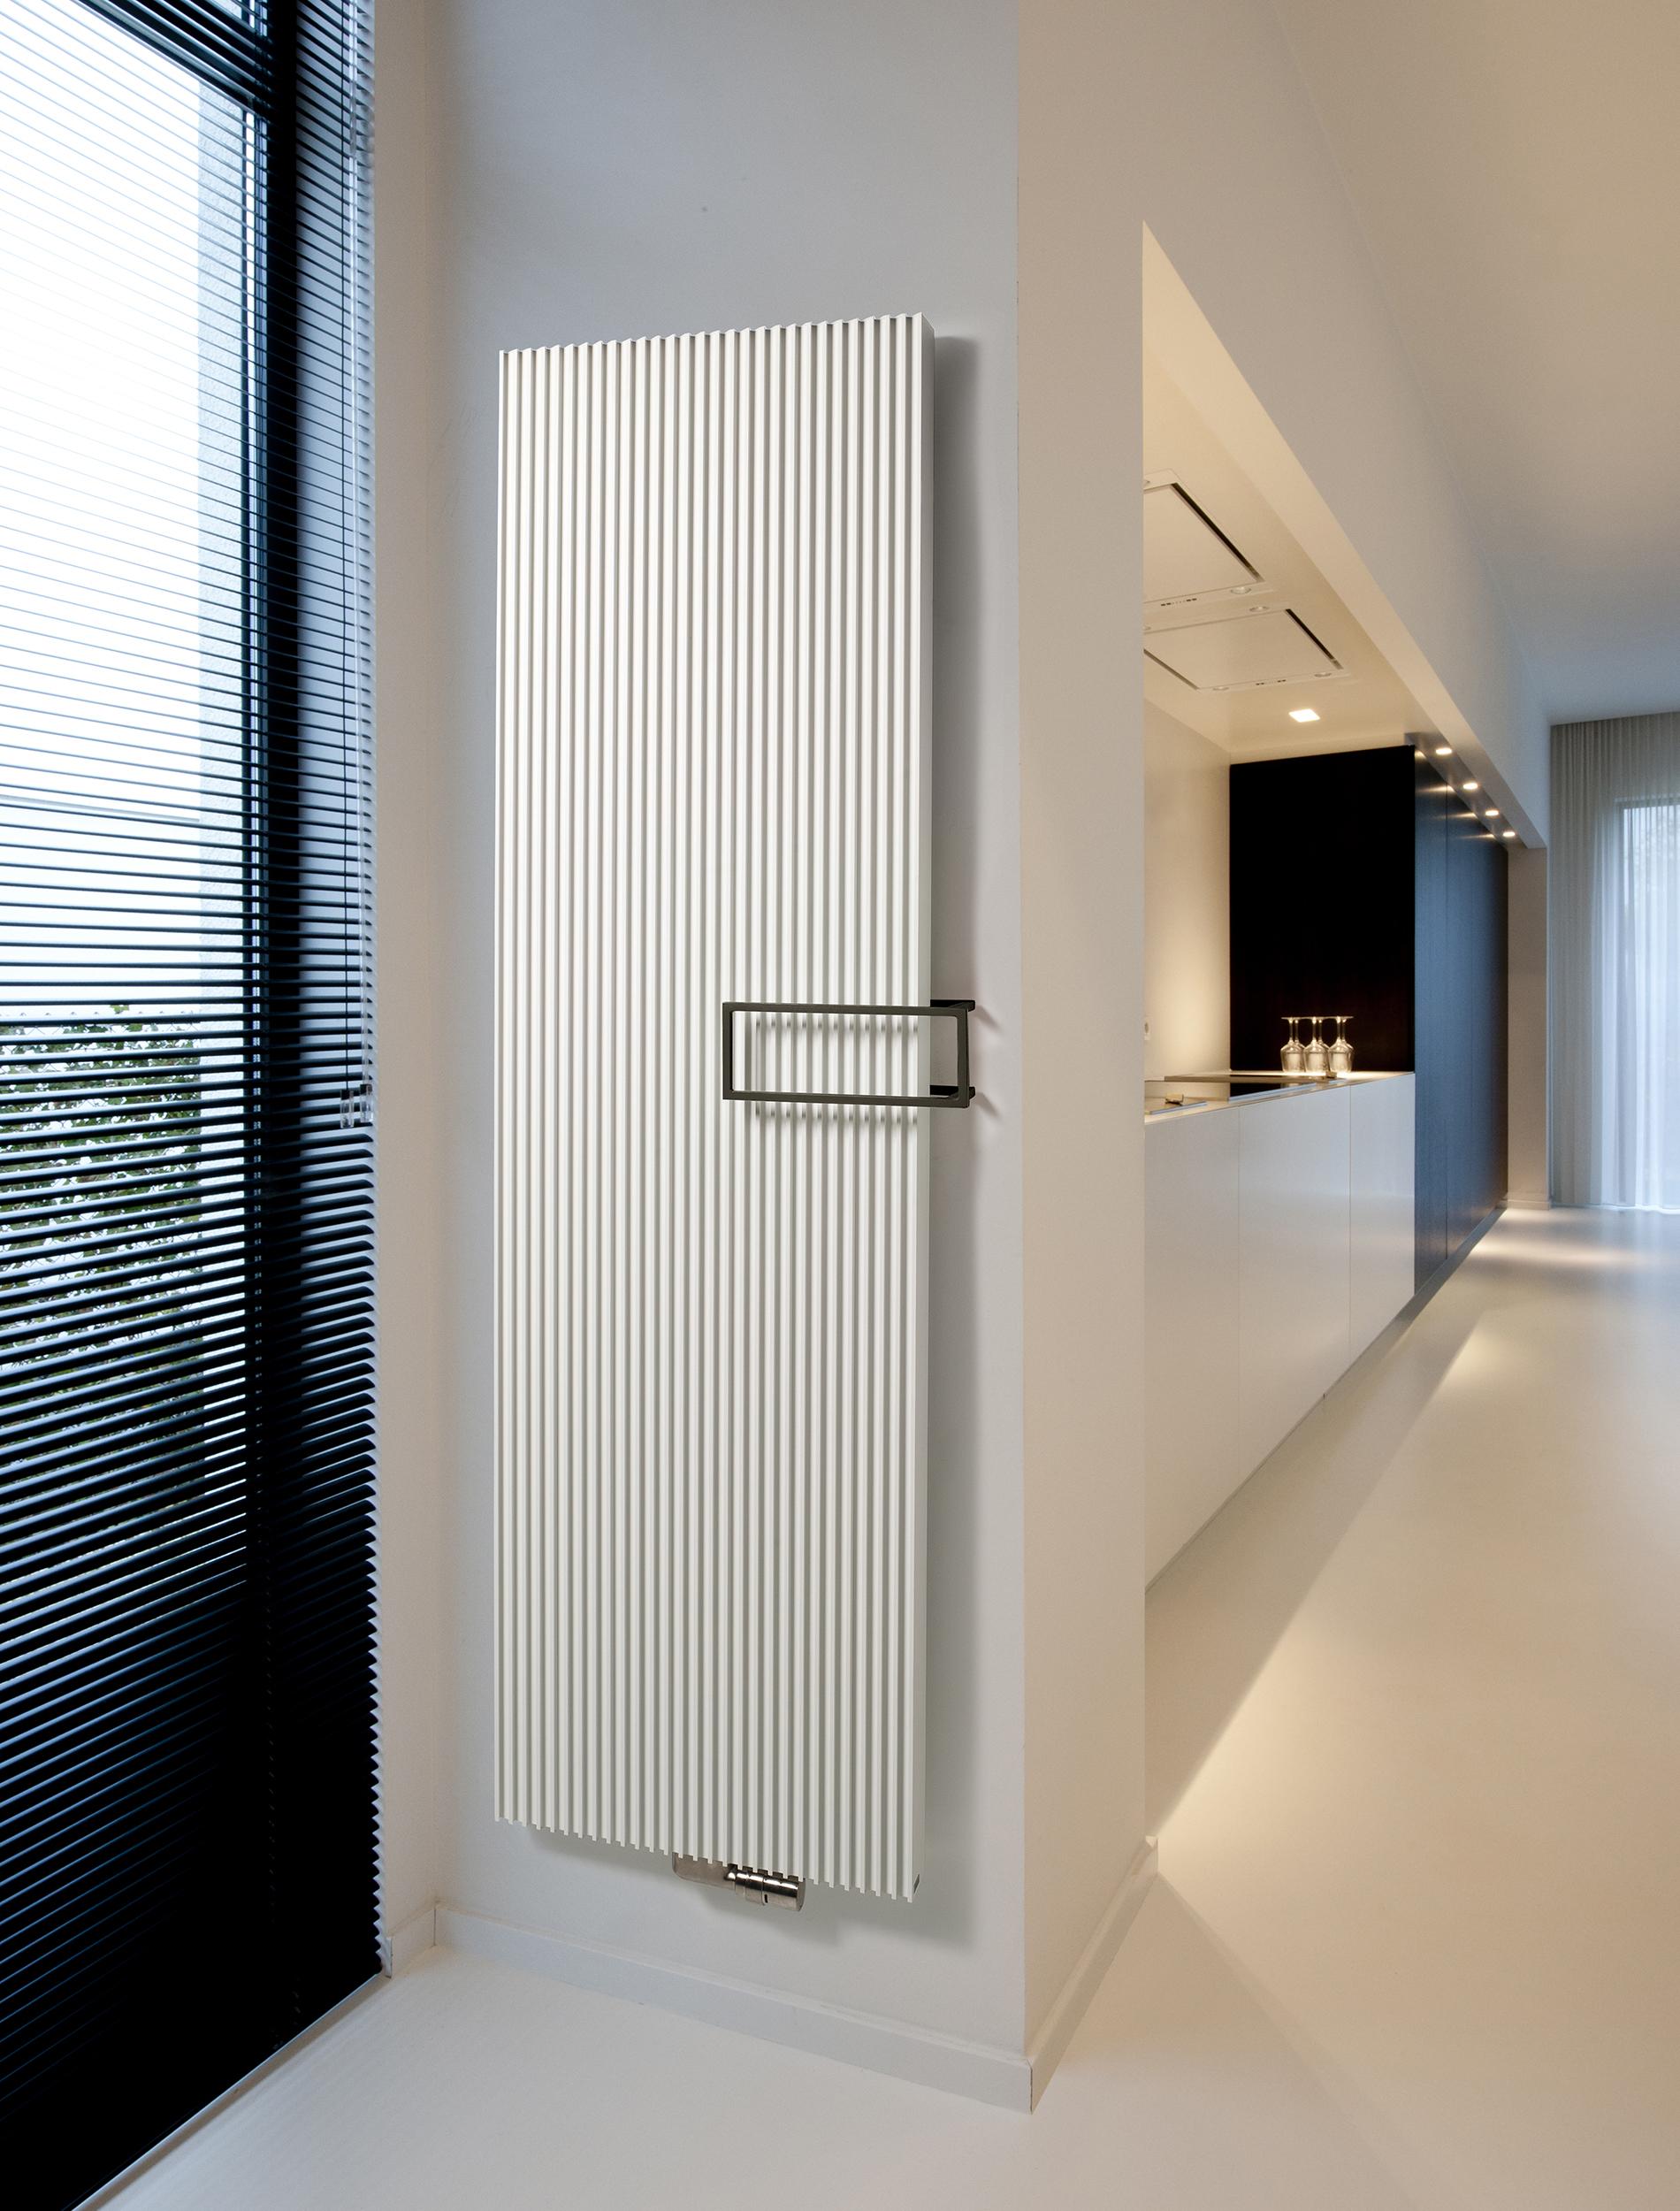 Calorifere decorative din aluminiu vasco for Vasco radiatori